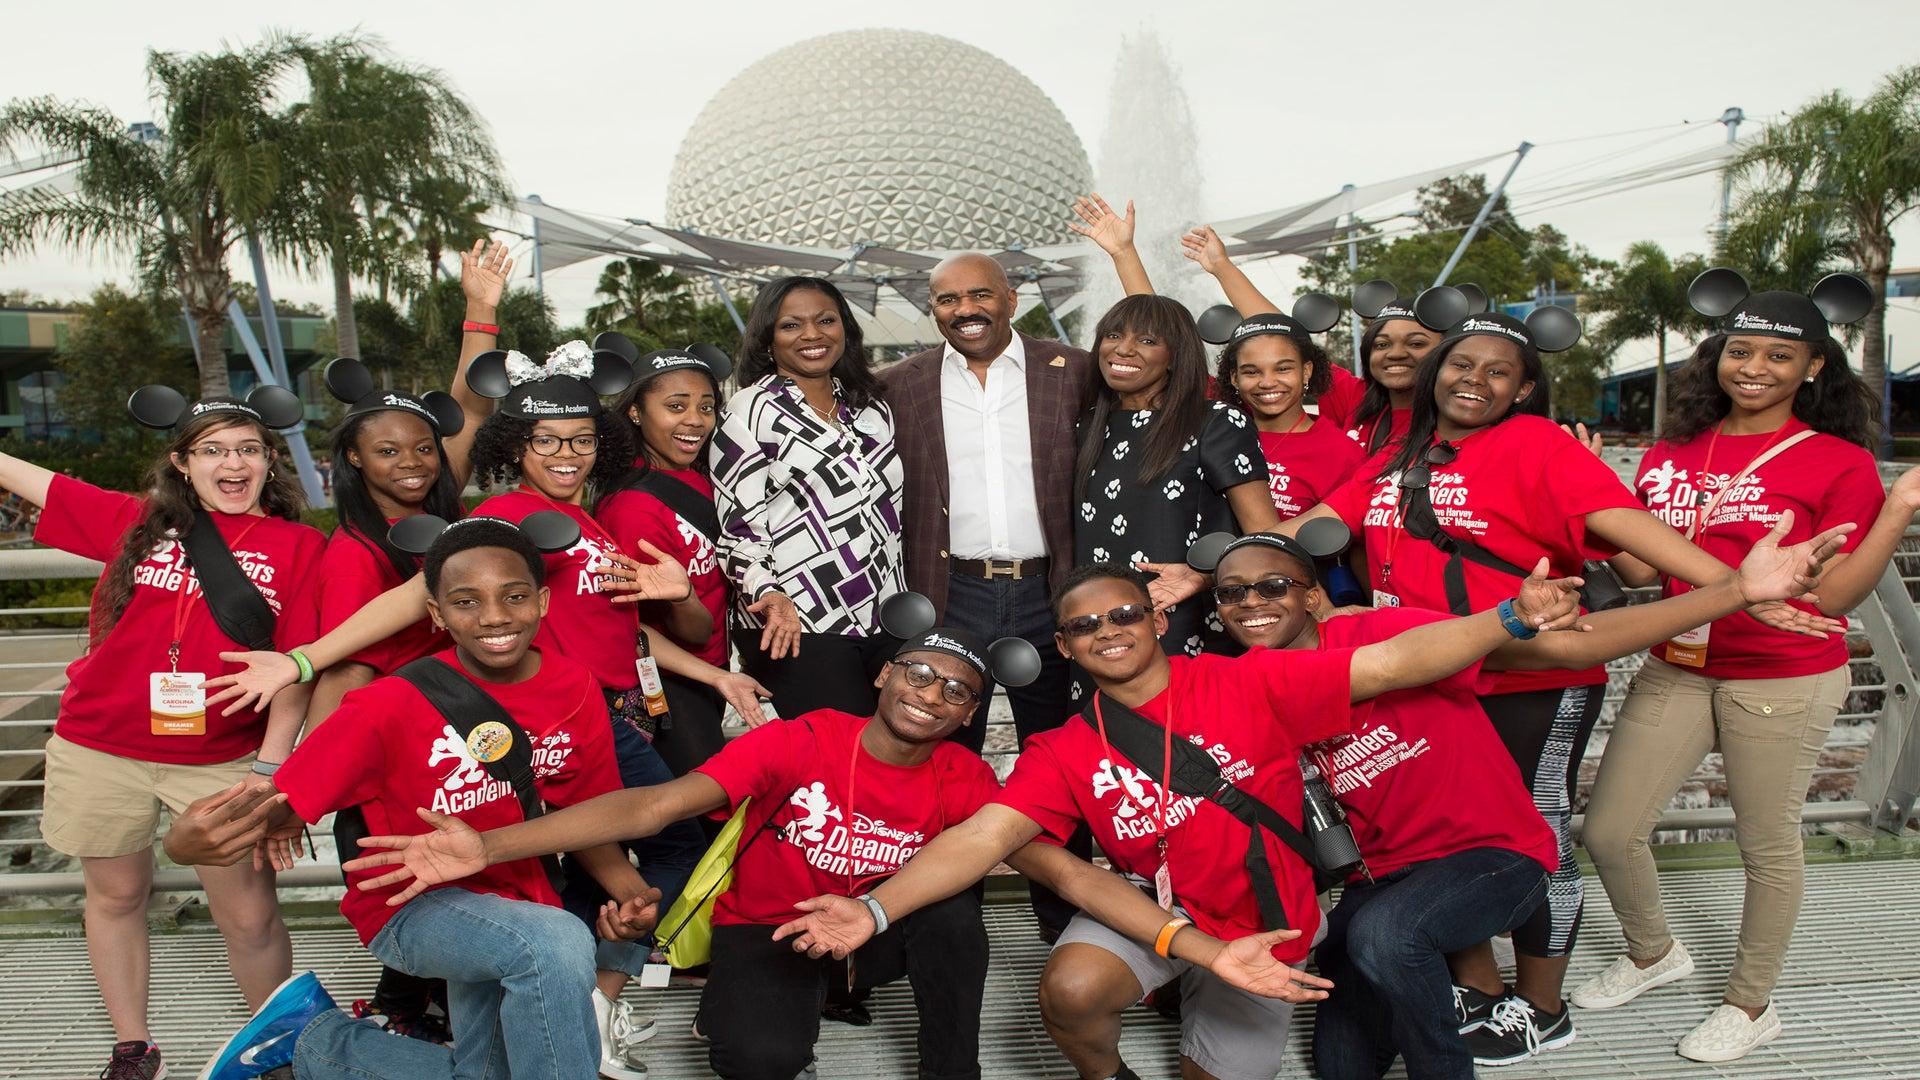 Last Call for 2018 Disney Dreamers Academy High School Applicants